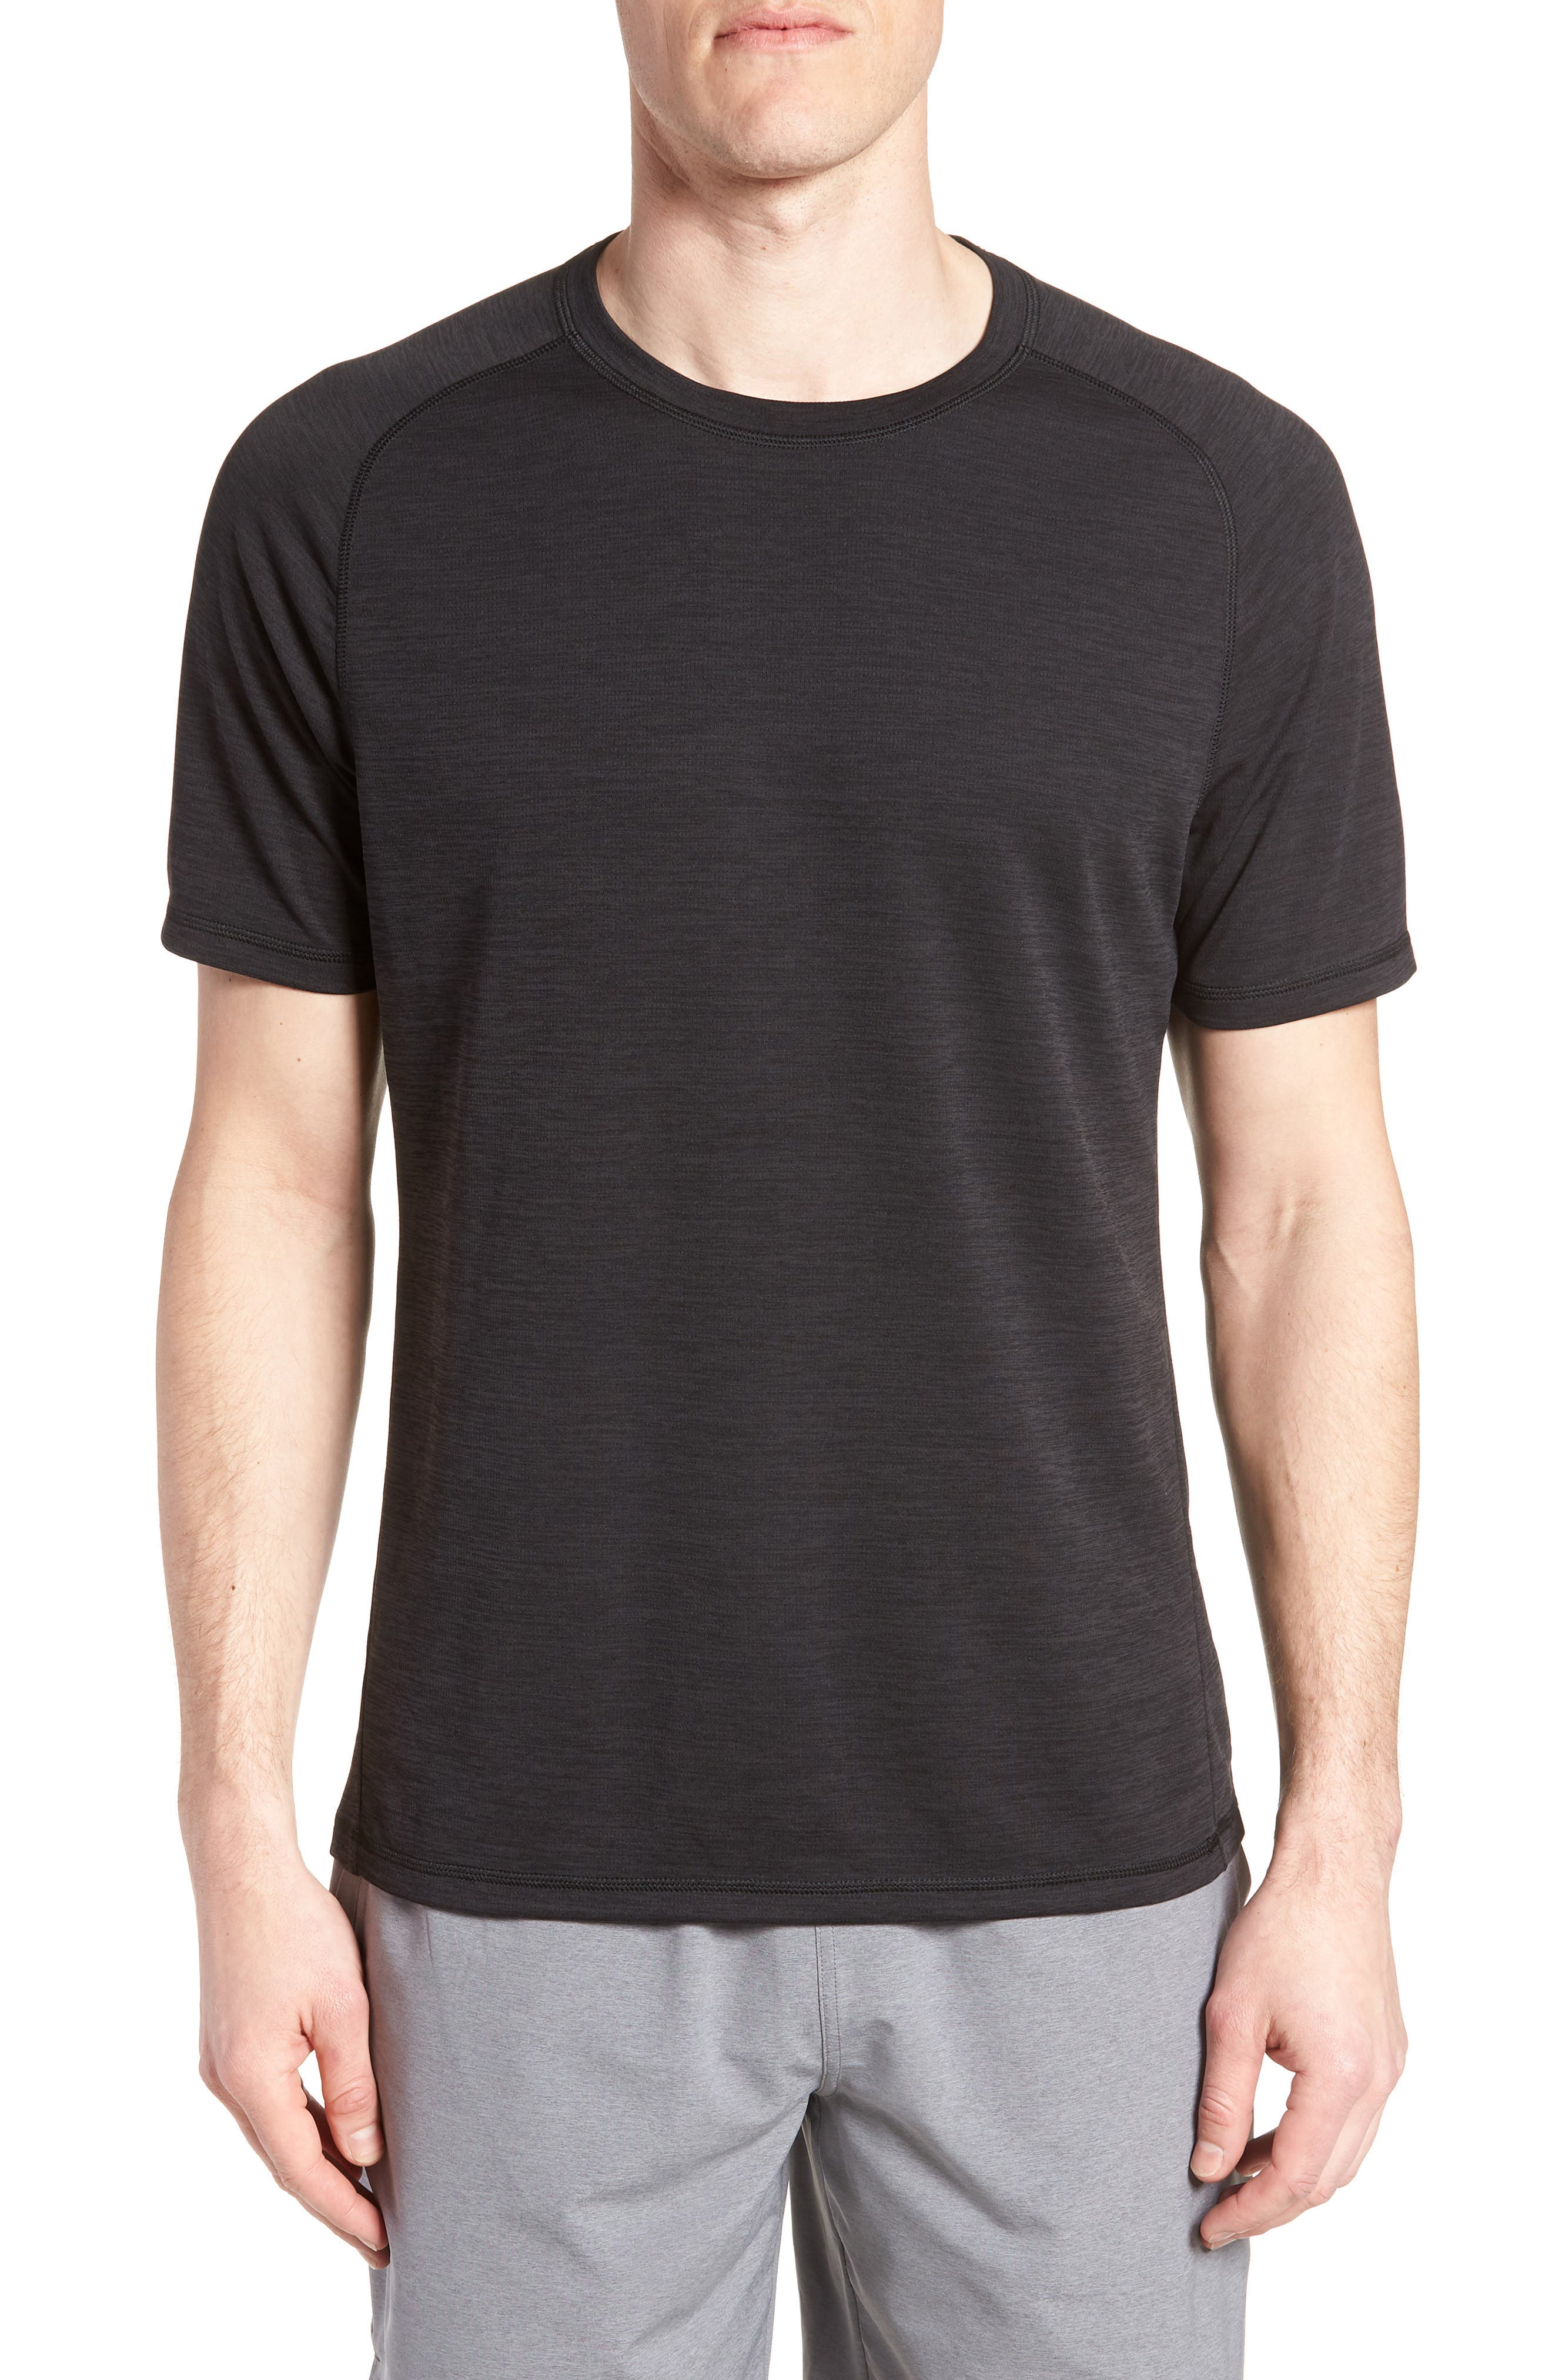 ZELLA Kinoite Raglan Crewneck T-Shirt, Main, color, BLACK OXIDE MELANGE